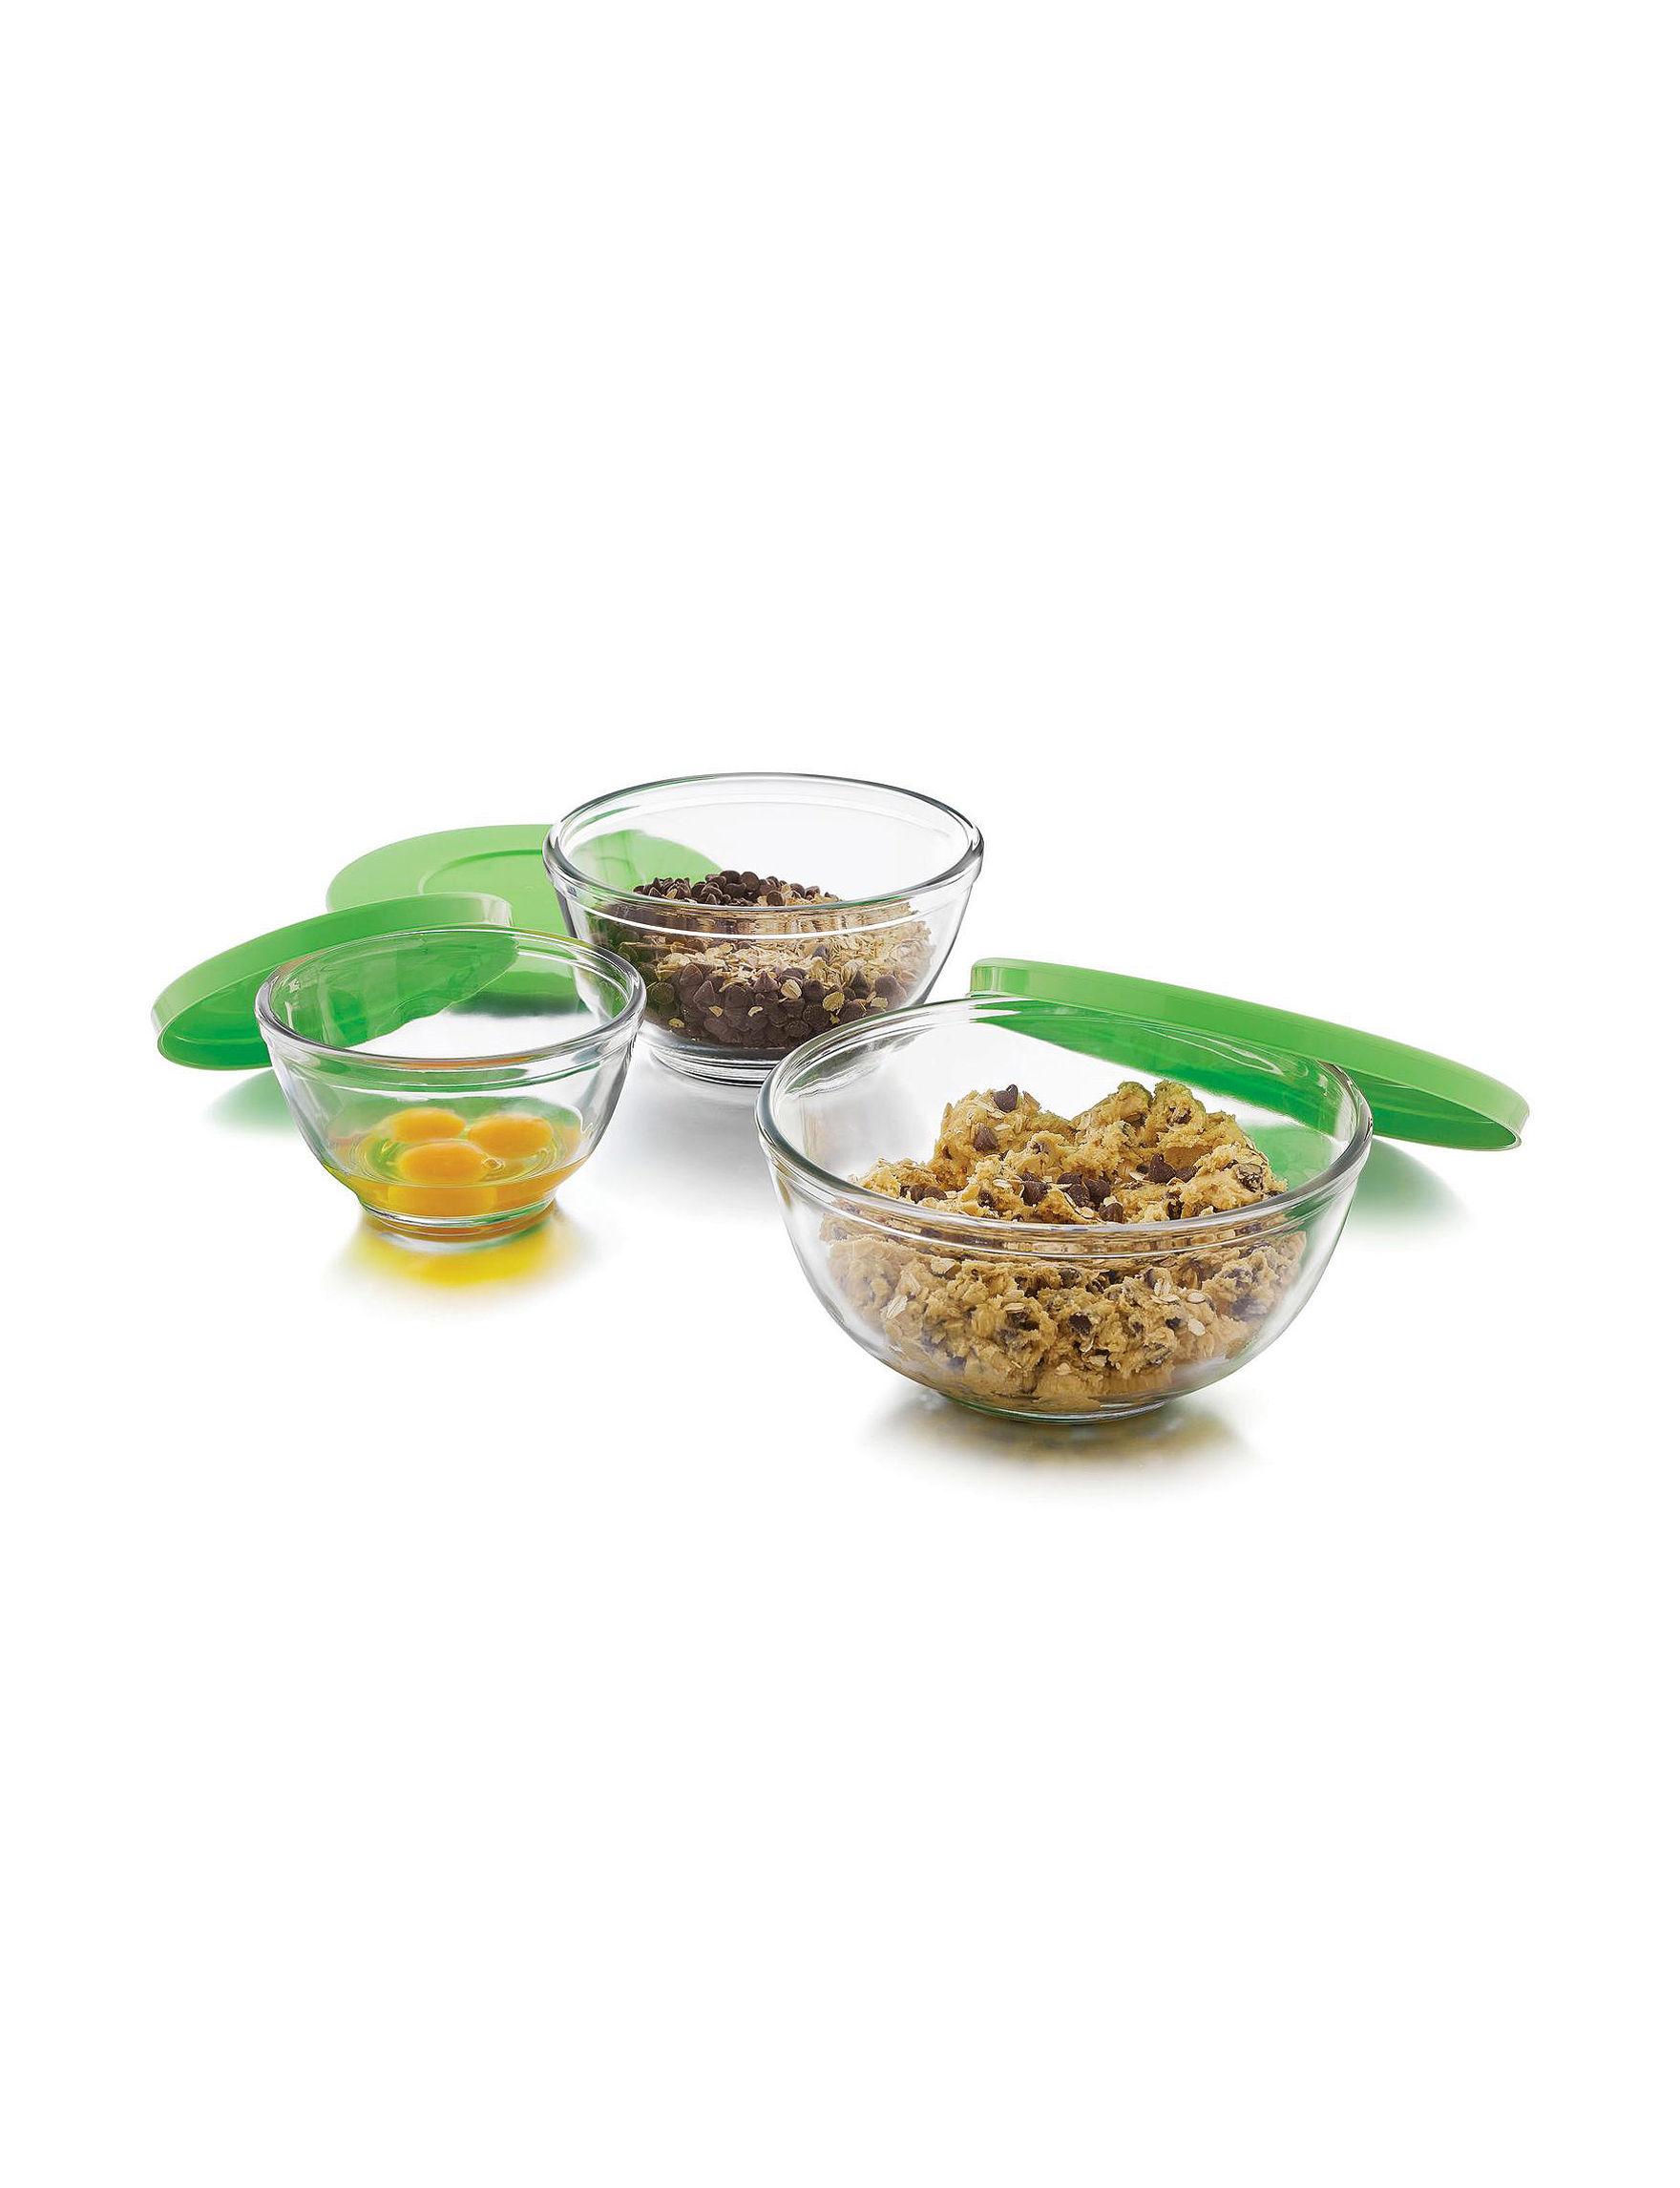 Libbey Glassware White / Green Mixing Bowls Prep & Tools